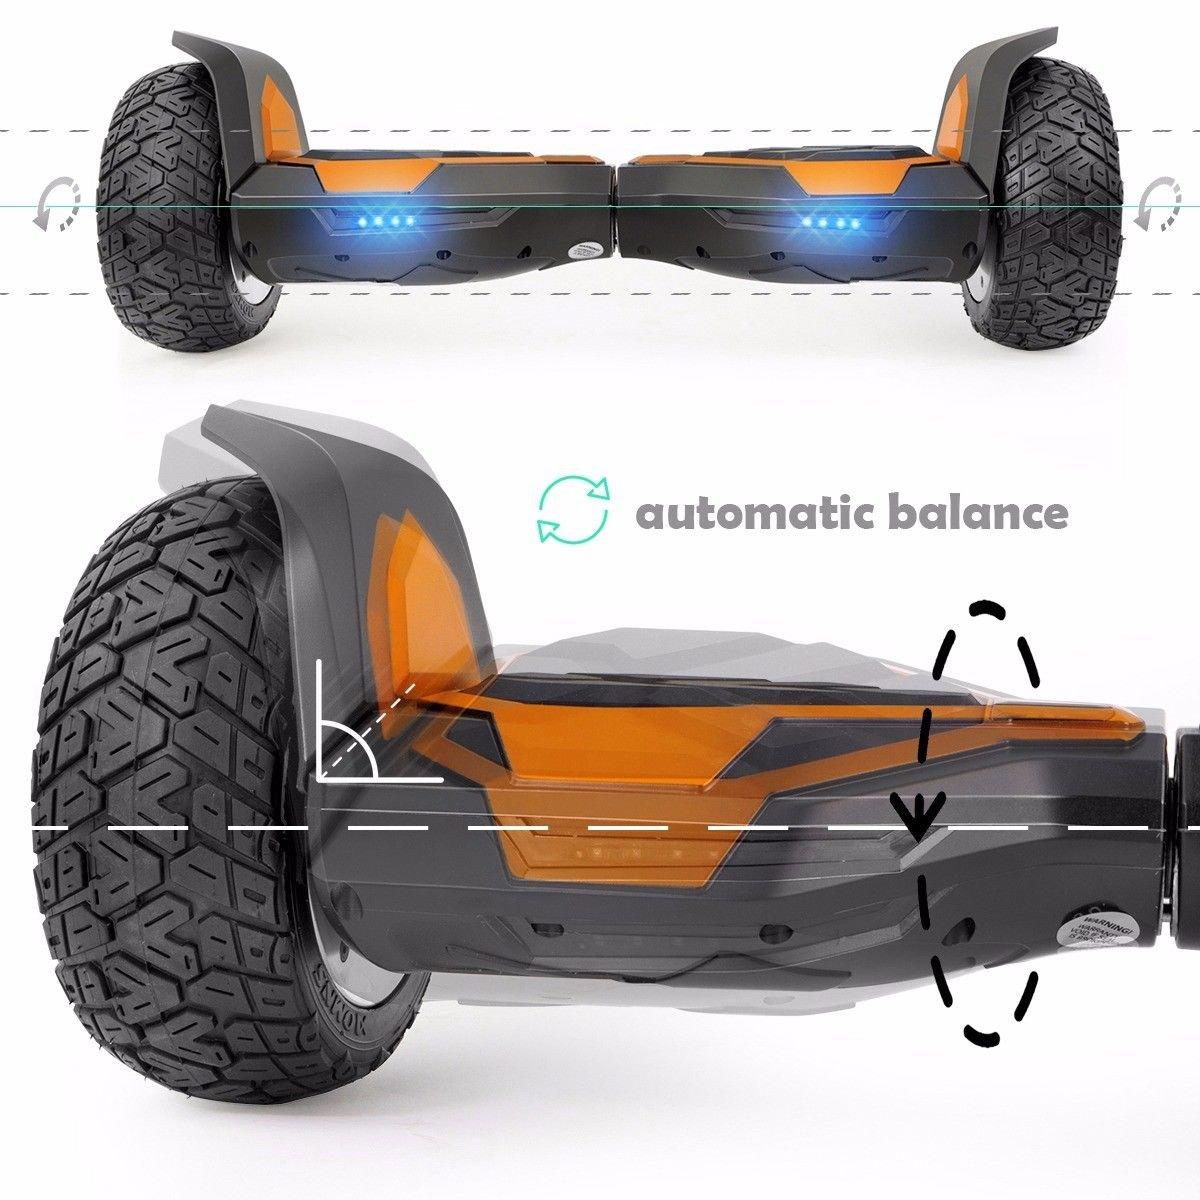 Amazon.com: V-Fire Ninja - Altavoz eléctrico autoequilibrado ...